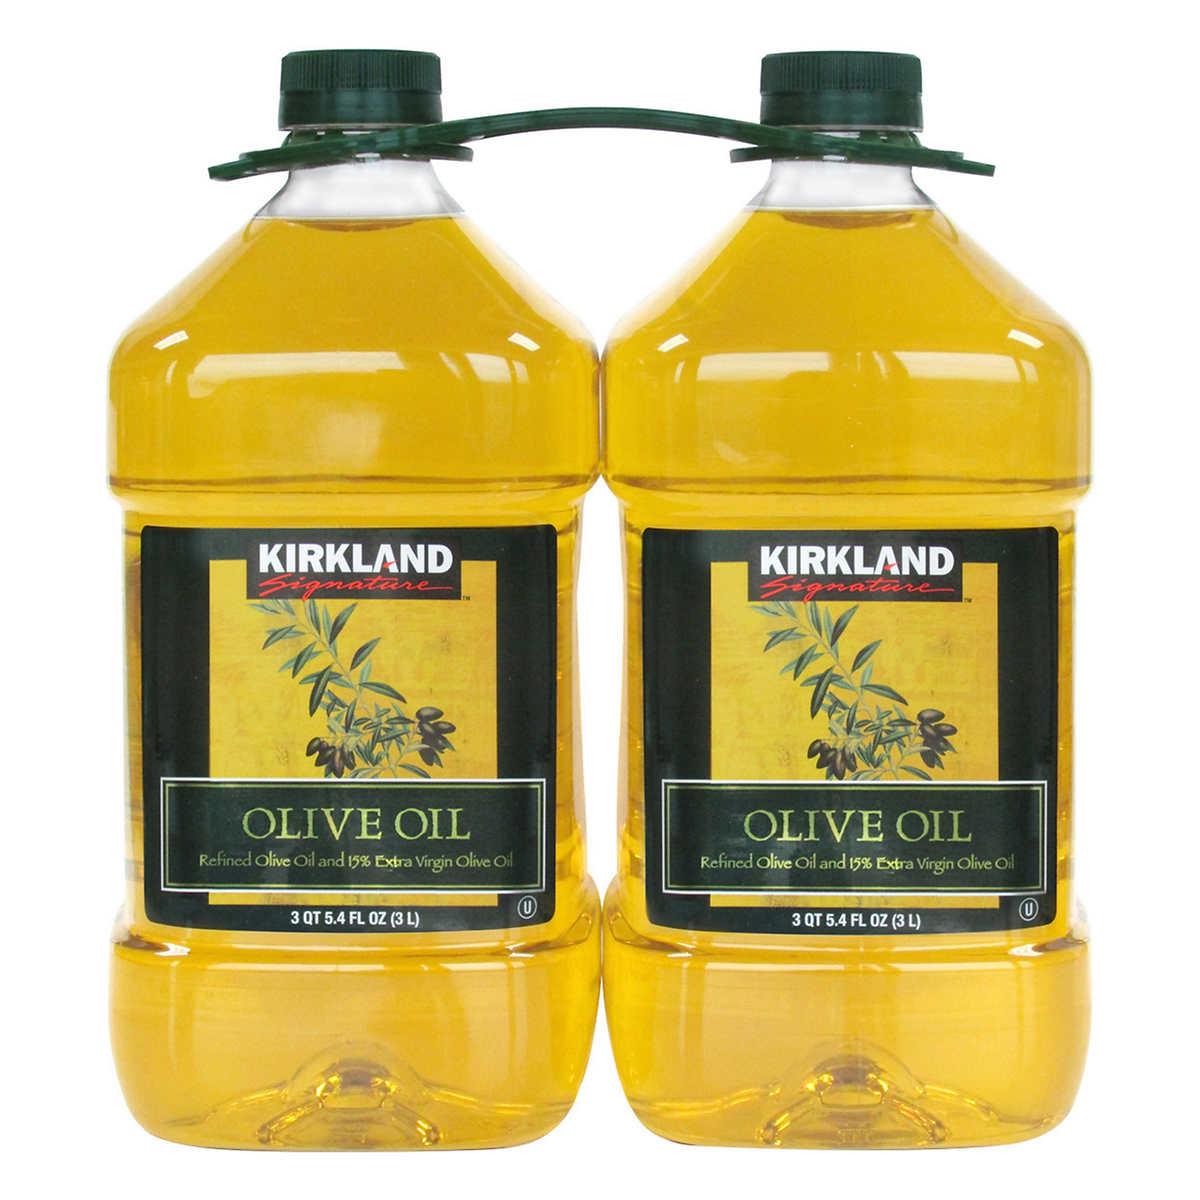 Kirkland Signature Pure Olive Oil 3 Liter, 2-count